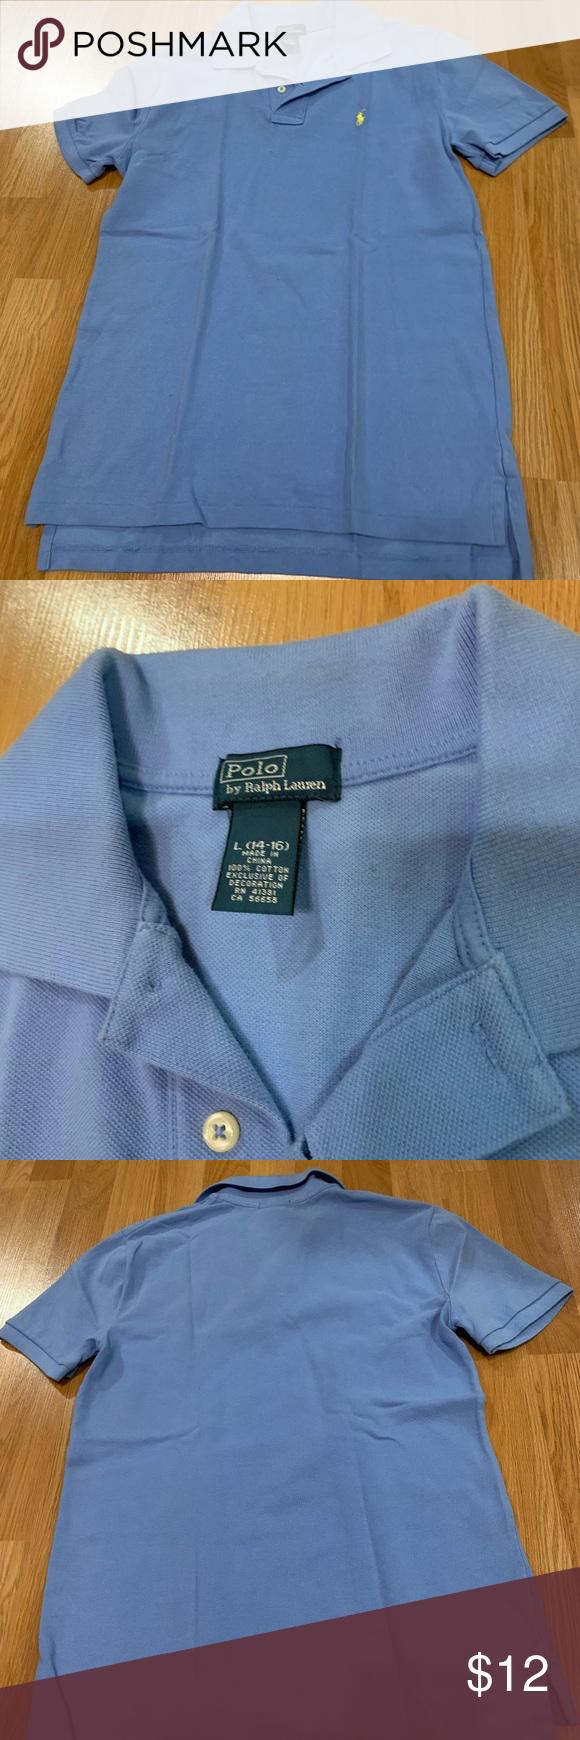 Light Blue Polo Shirt With Yellow Polo Logo Blue Polo Shirts Polo Logo Polo Shirt